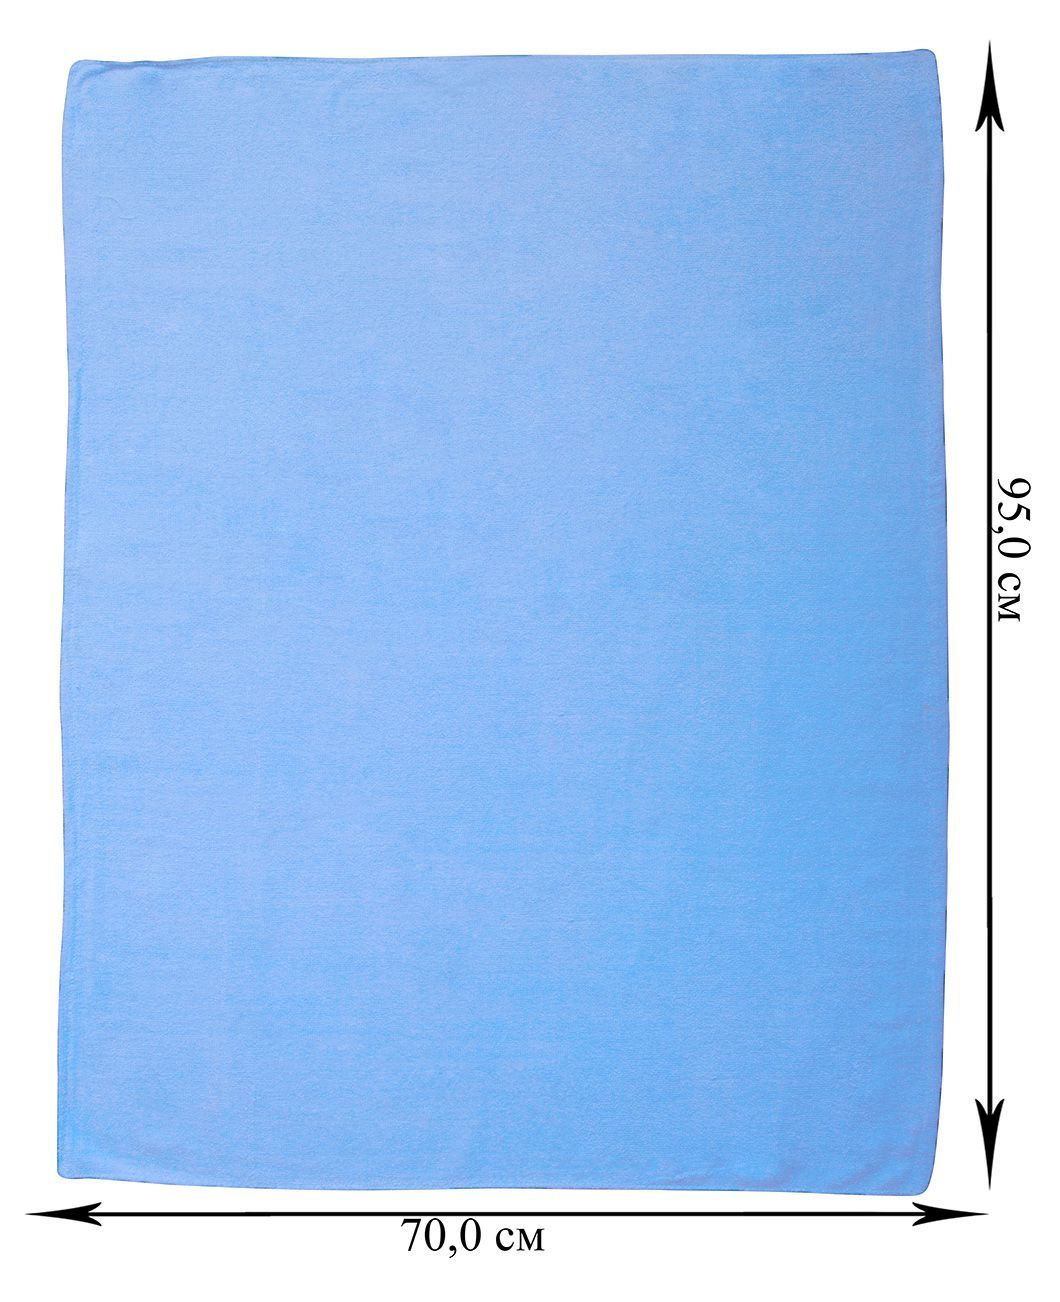 Банное полотенце - купить онлайн